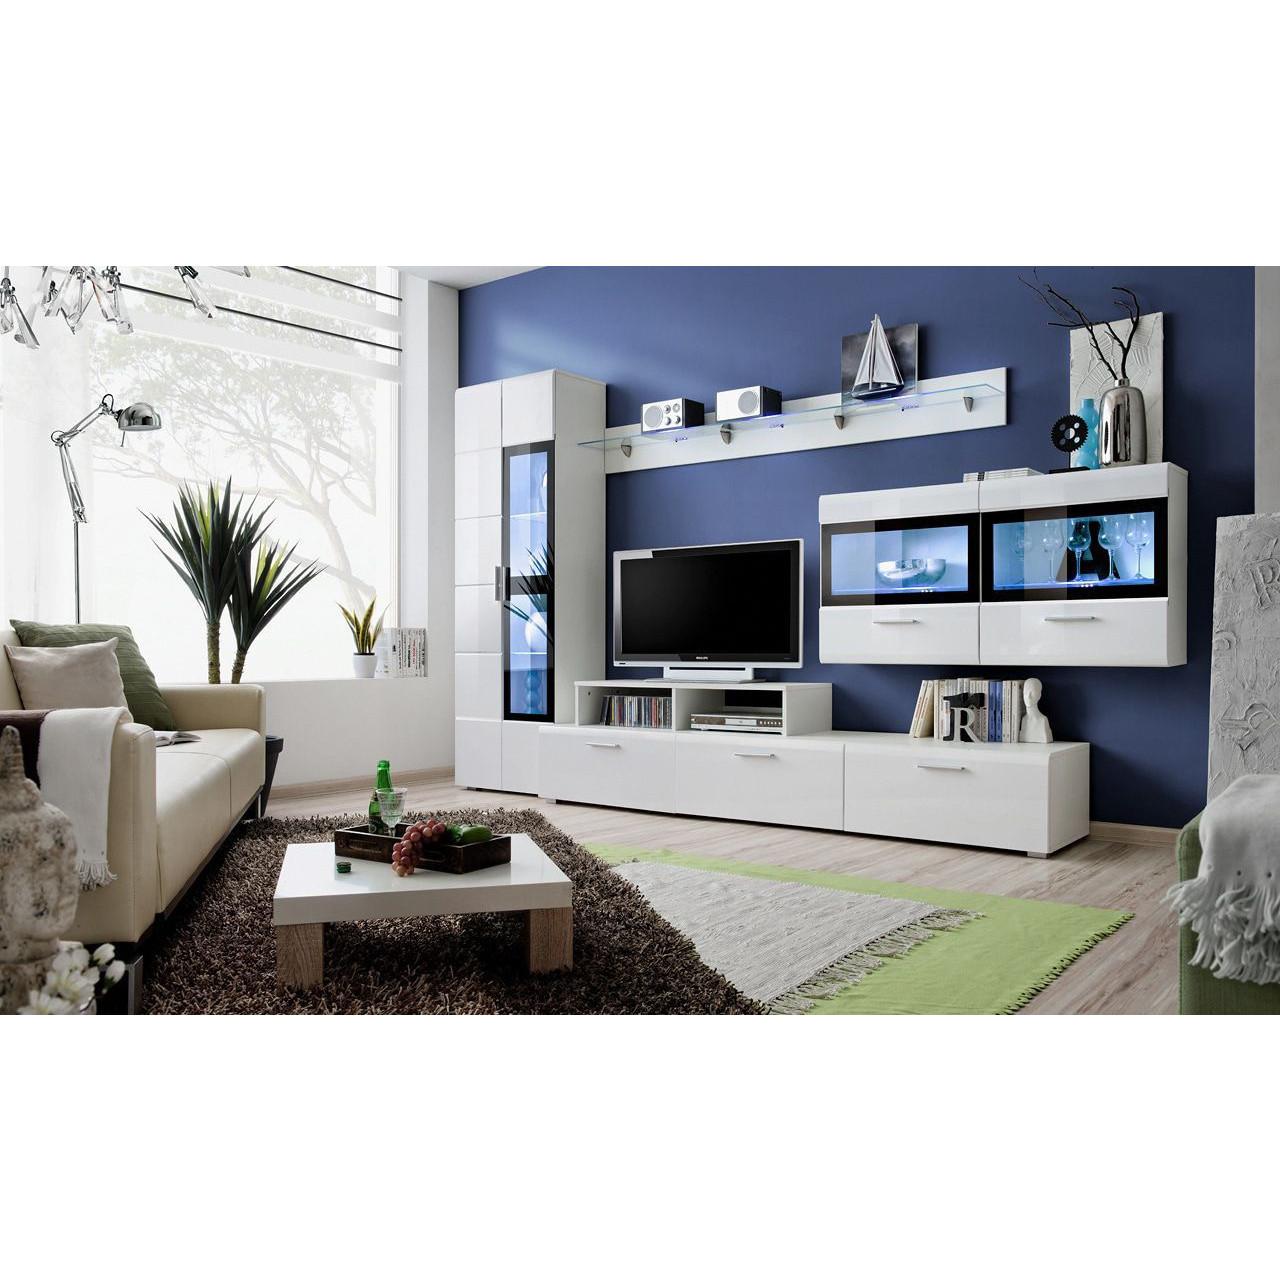 Ensemble Mural 300 Cm Avec Meuble Tv 2 Vitrines Concernant Supports Et Meubles Tv Agencecormierdelauniere Com Agencecormierdelauniere Com